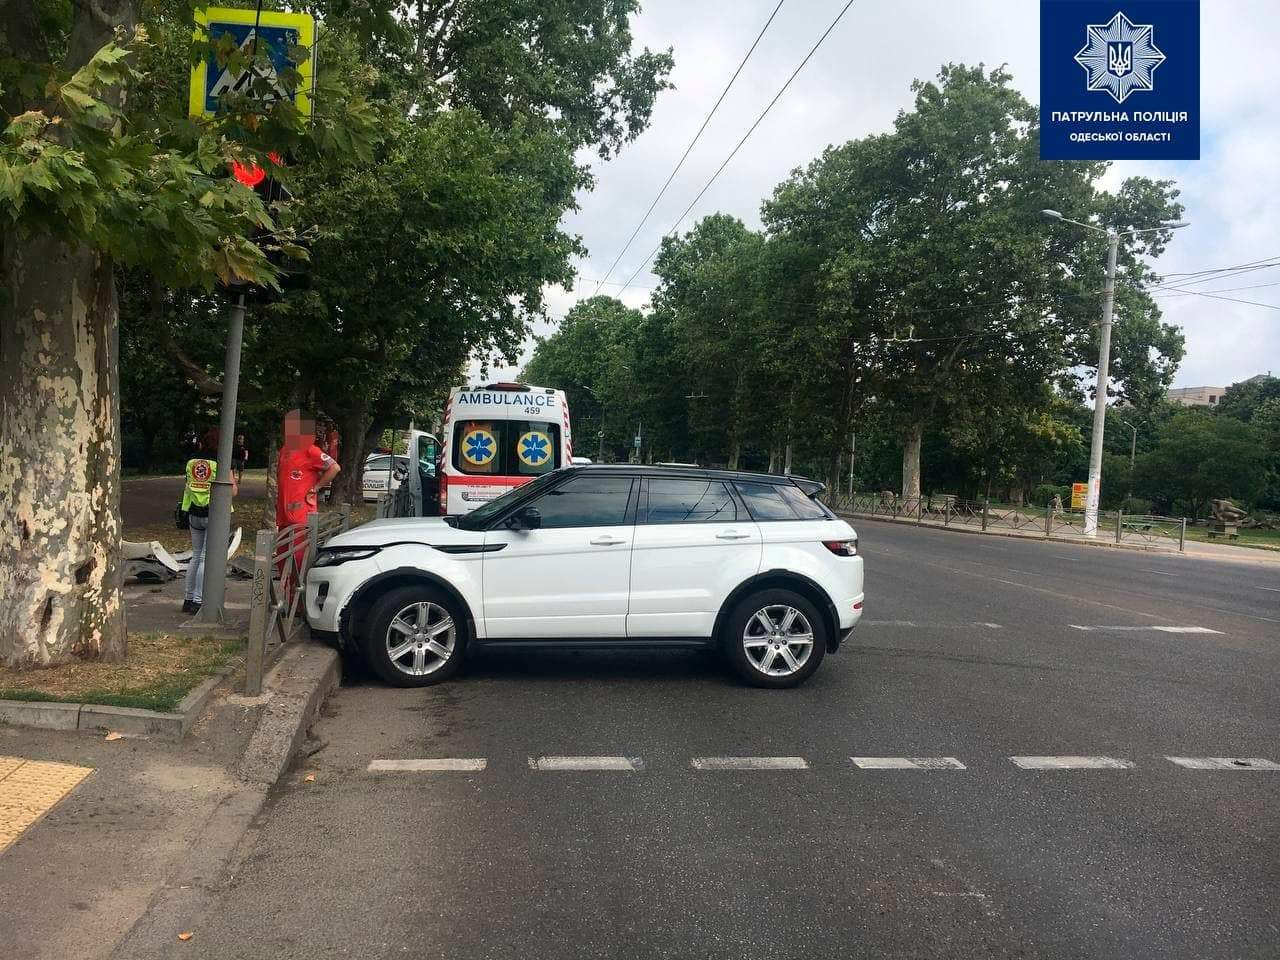 ДТП Одеса 2 серпня 2021